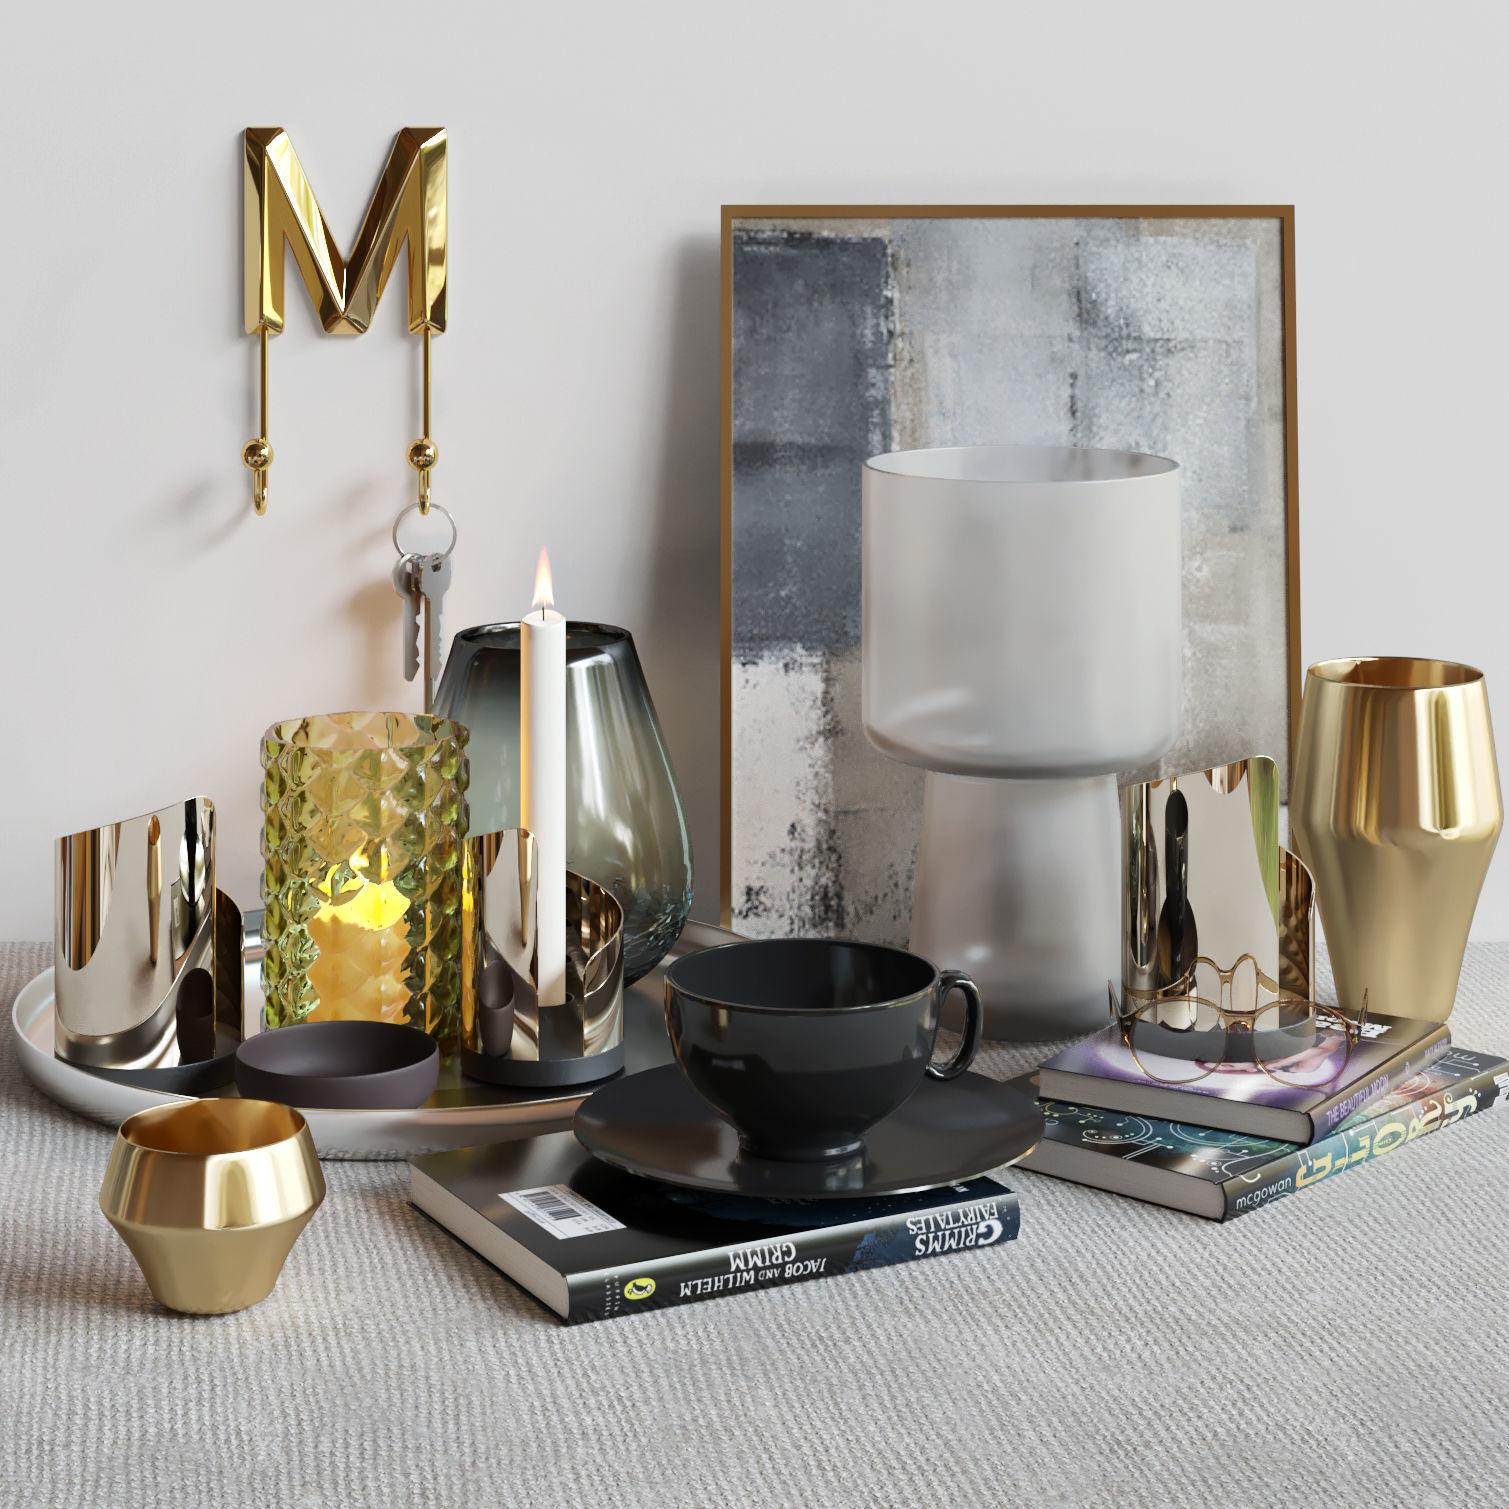 Decorative set for modern interior 2